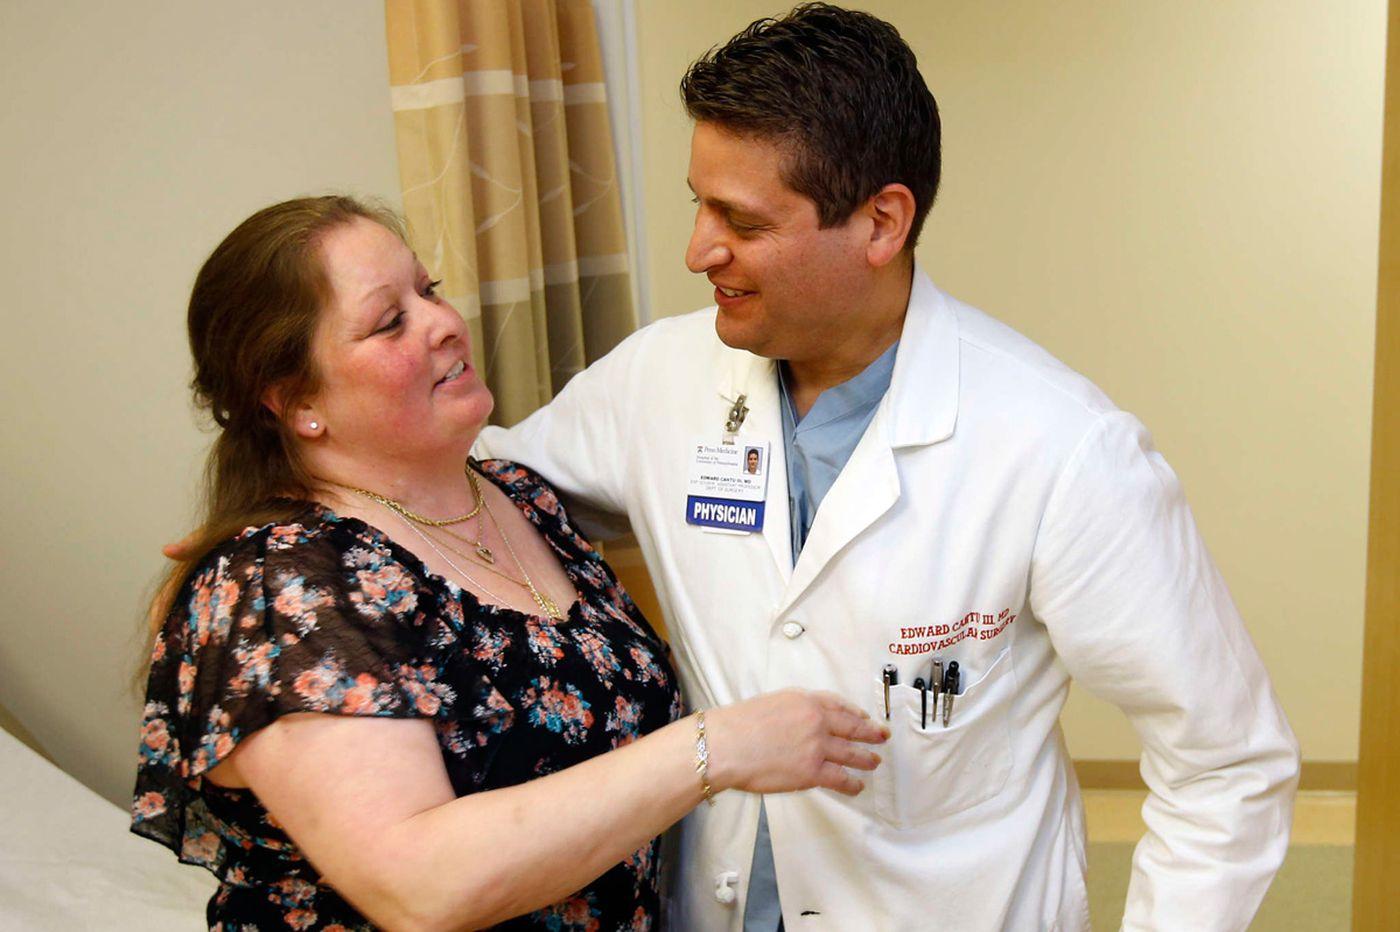 For organs kept alive before transplant, tantalizing possibilities